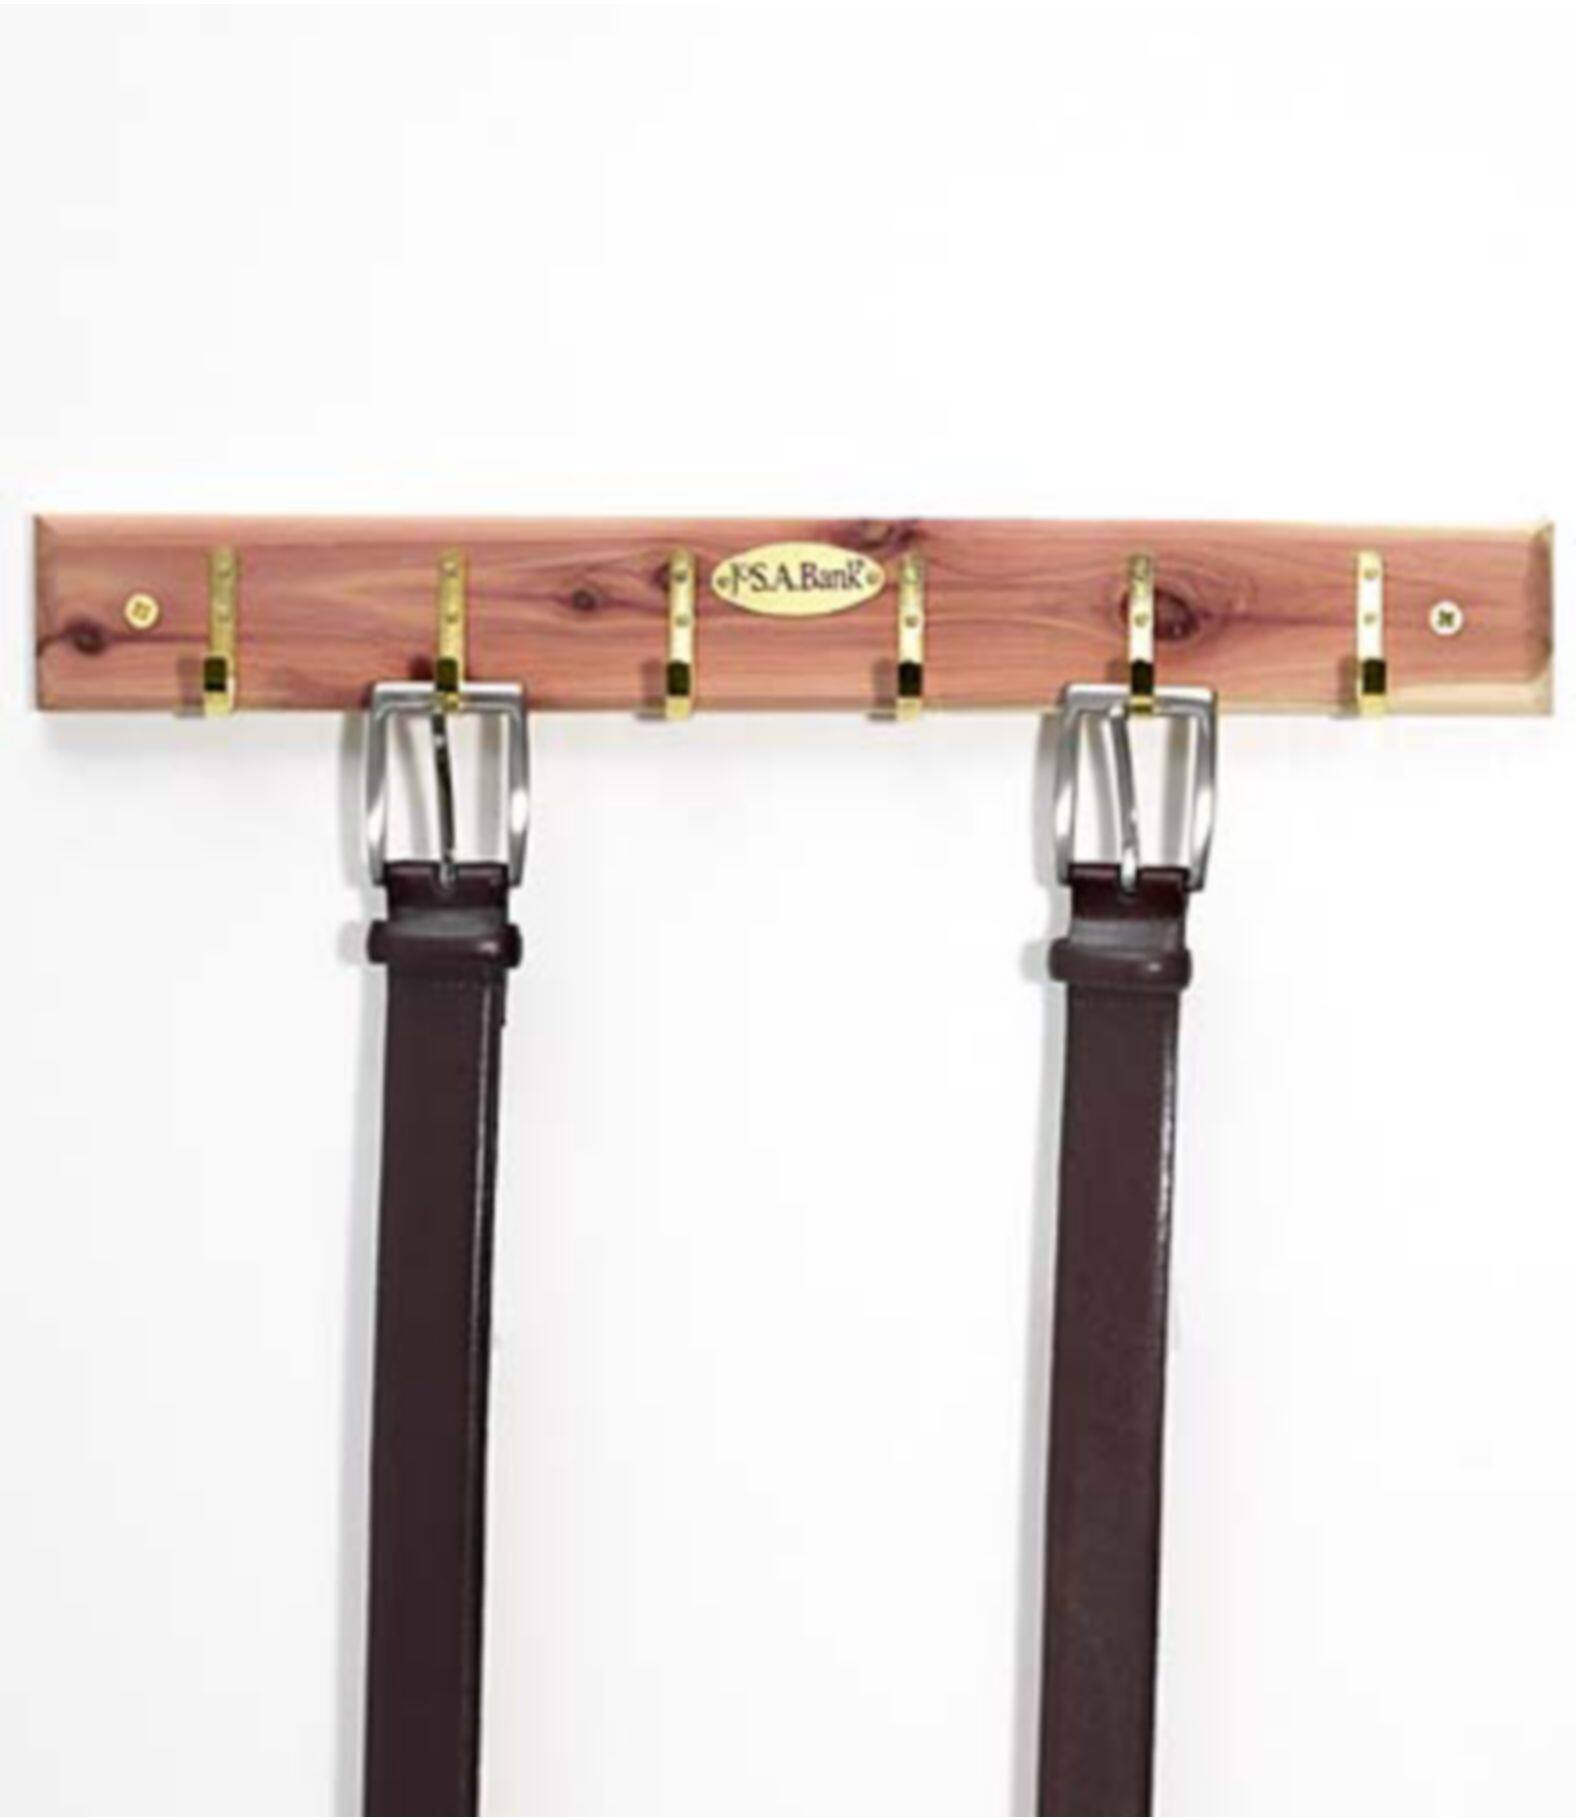 Jos A Banks Accessory Sale: Cedar Belt Rack $3.49, Belt Spinner $3.49, 2-Pack Standard Cedar Hangers $3.49, Cedar Tie Rack $4.99 & More + Free Shipping w/ Bank Account Rewards